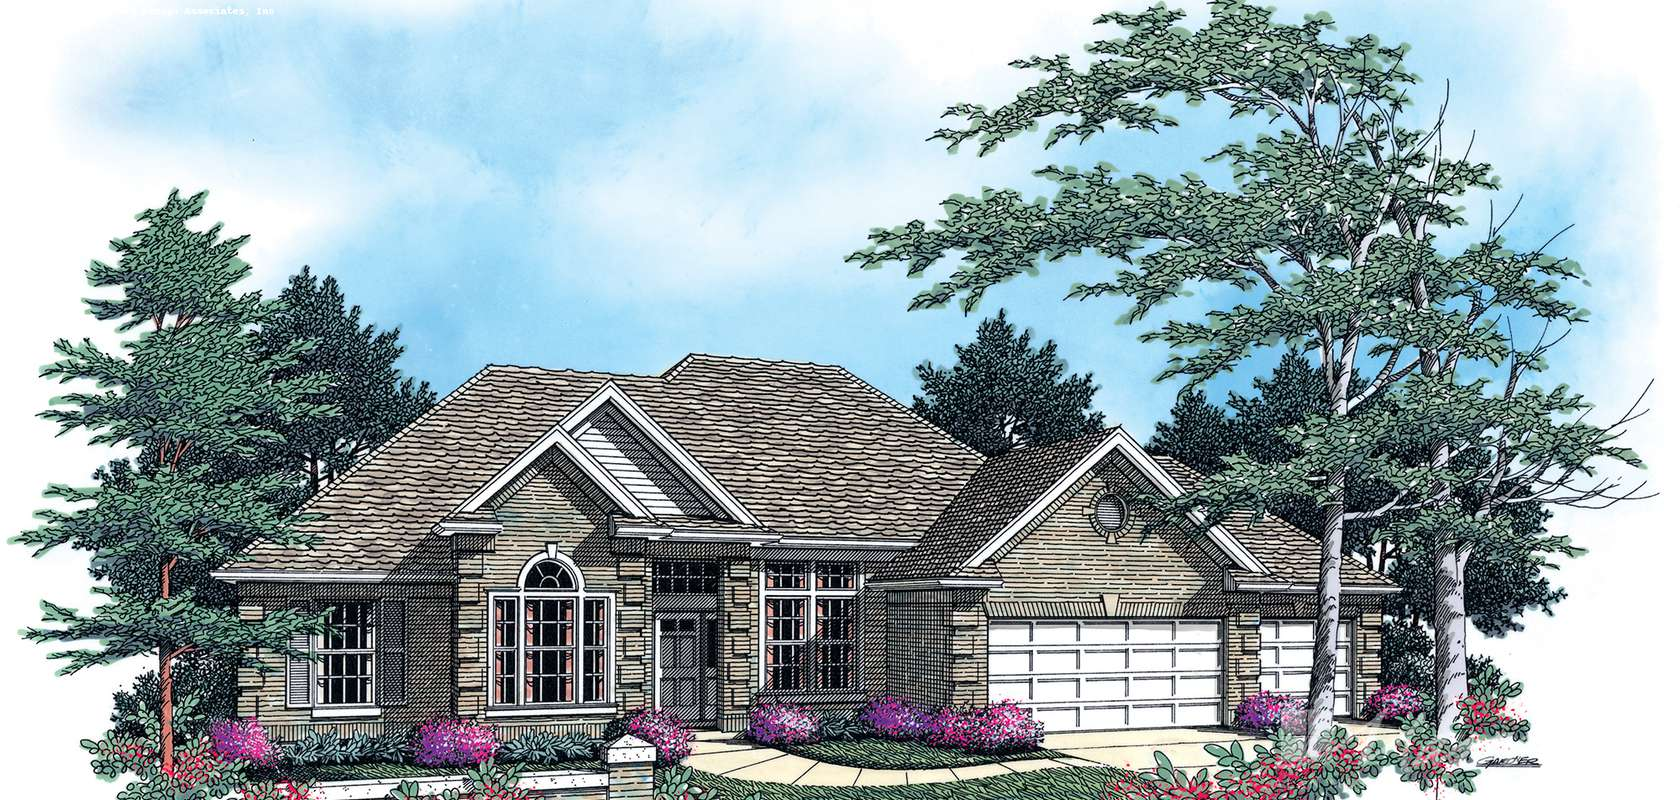 Mascord House Plan 1213: The Stephen